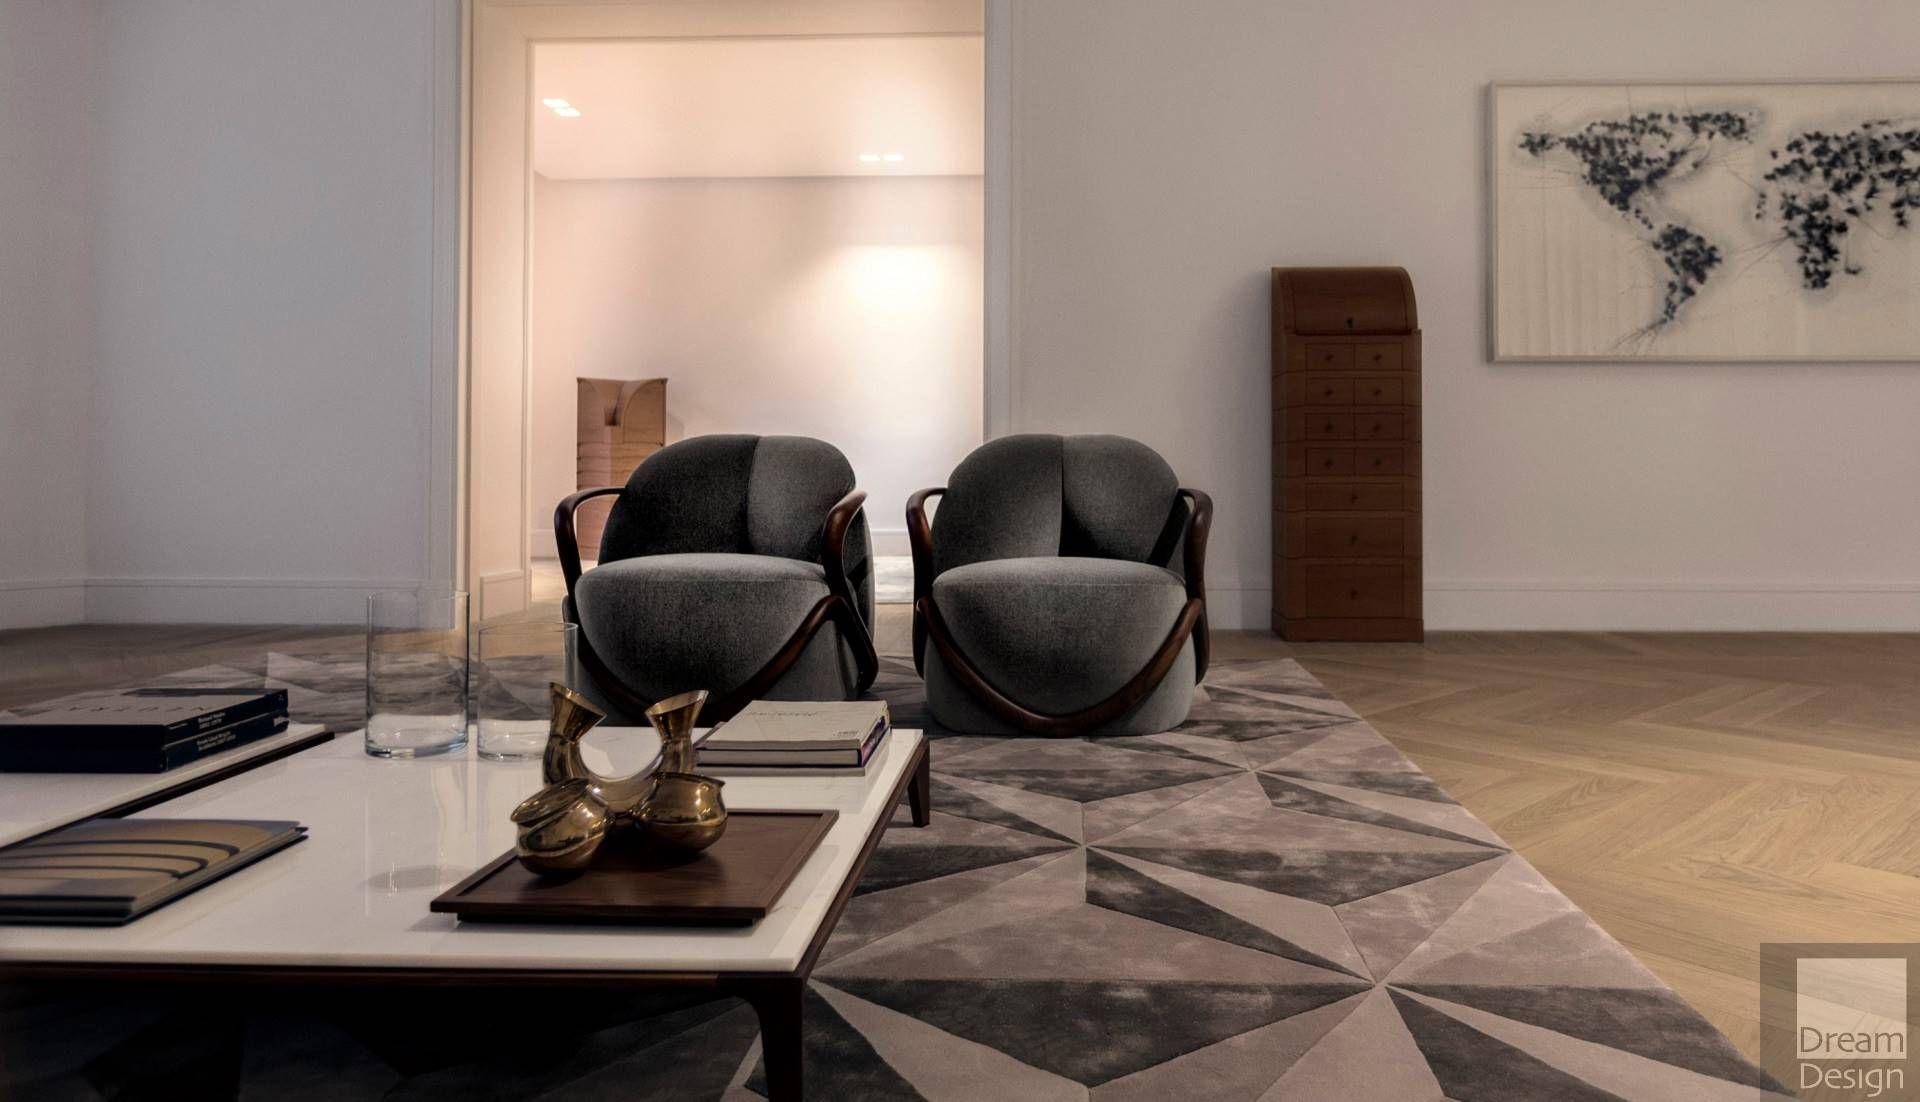 Hug Armchair Furniture, Furniture design